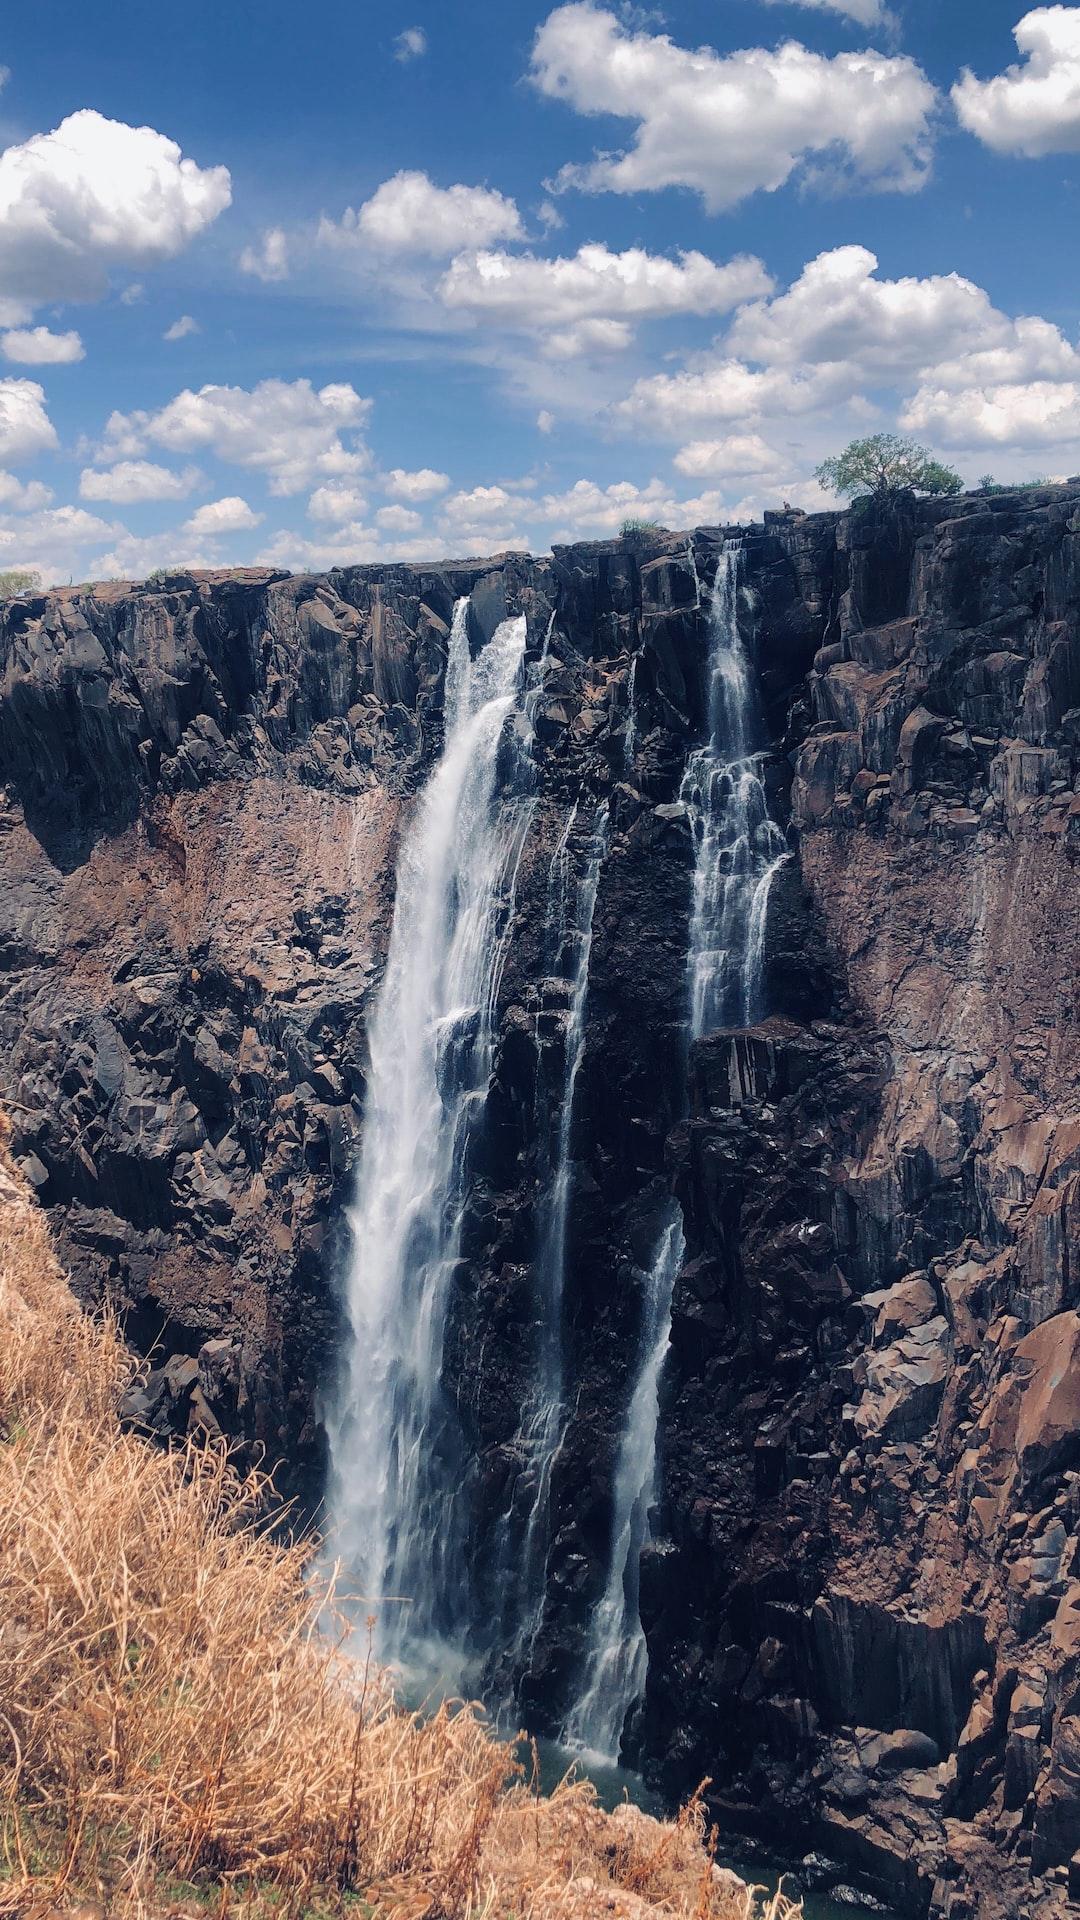 AKA Victoria Falls